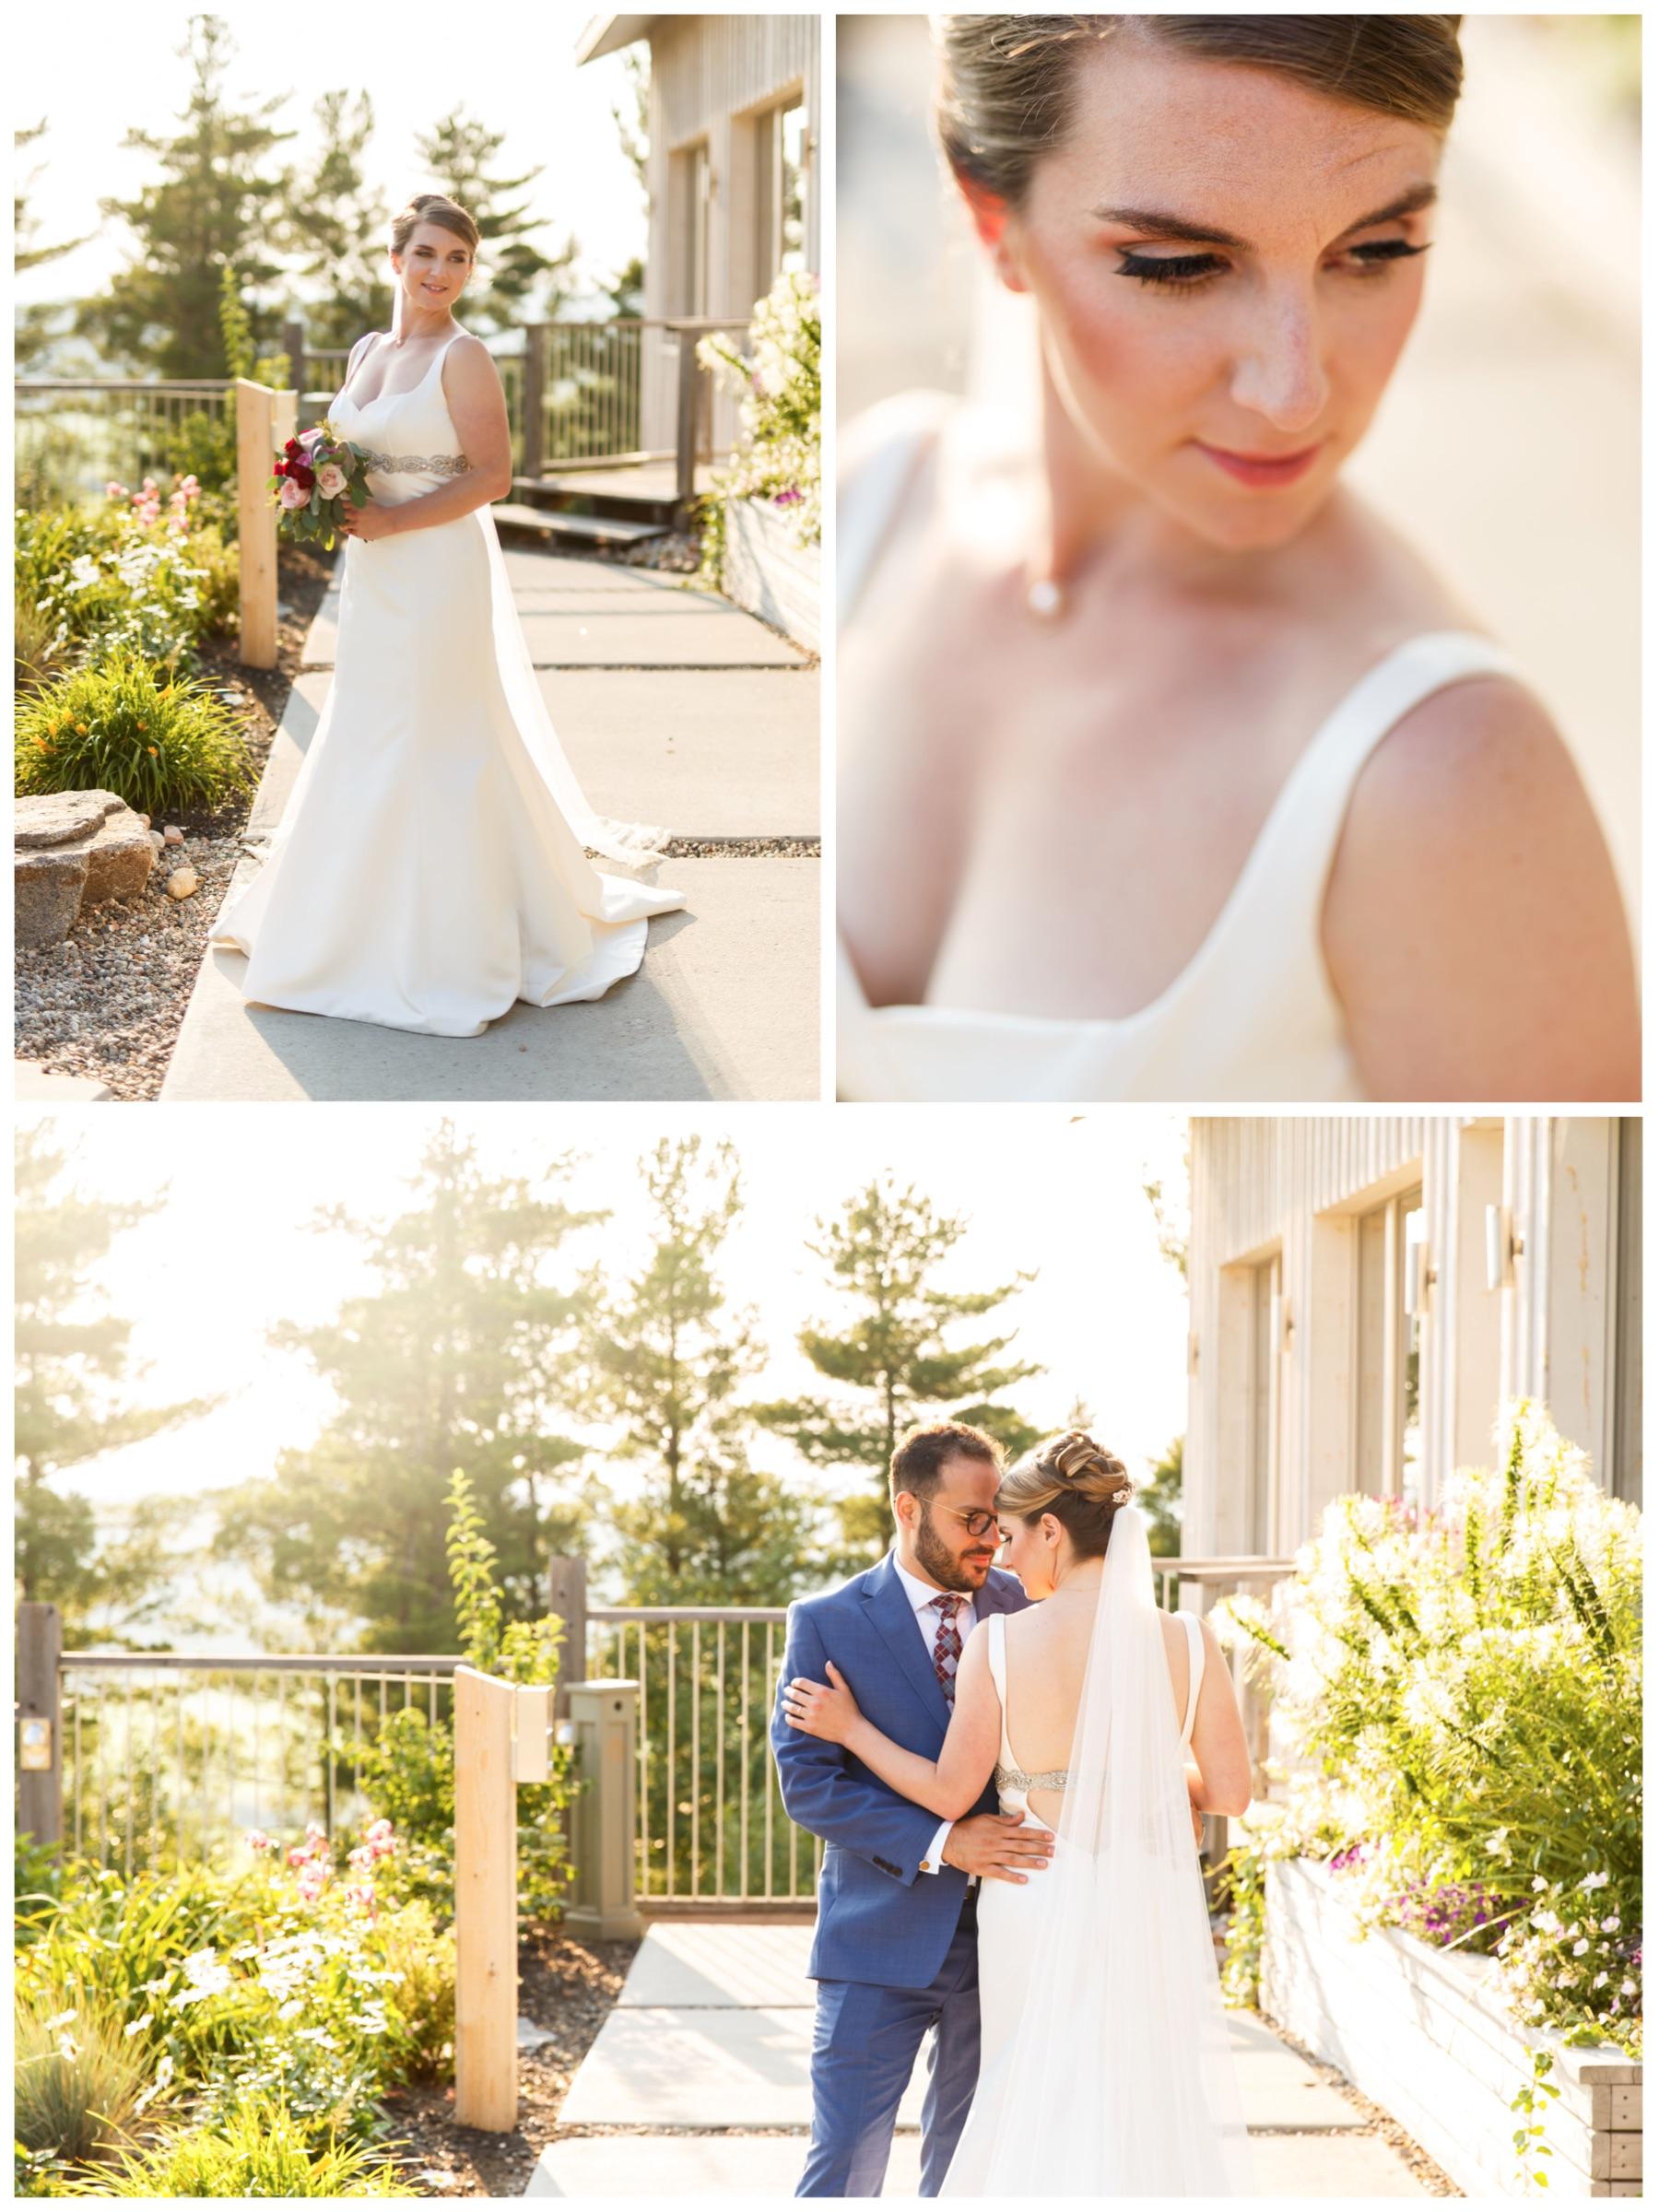 natural light portrait of a bride at le belvedere